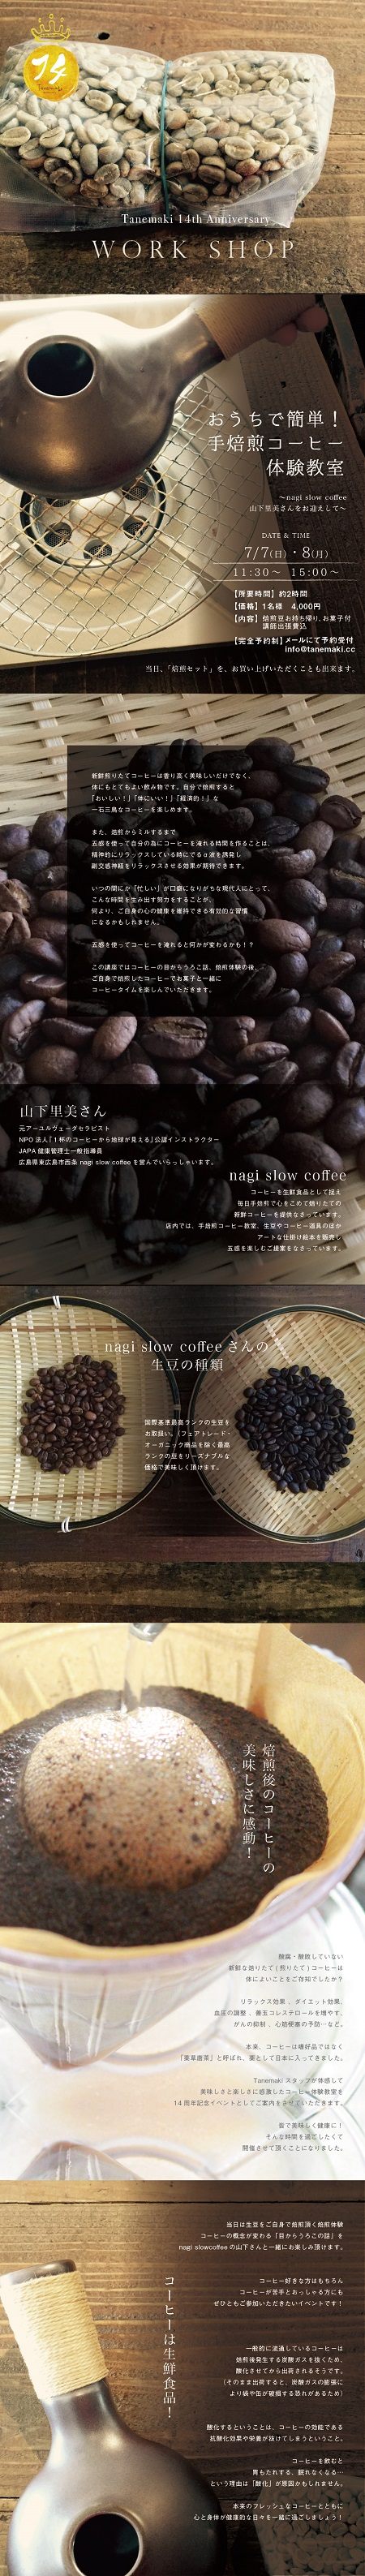 14th_workshop_coffee.jpg